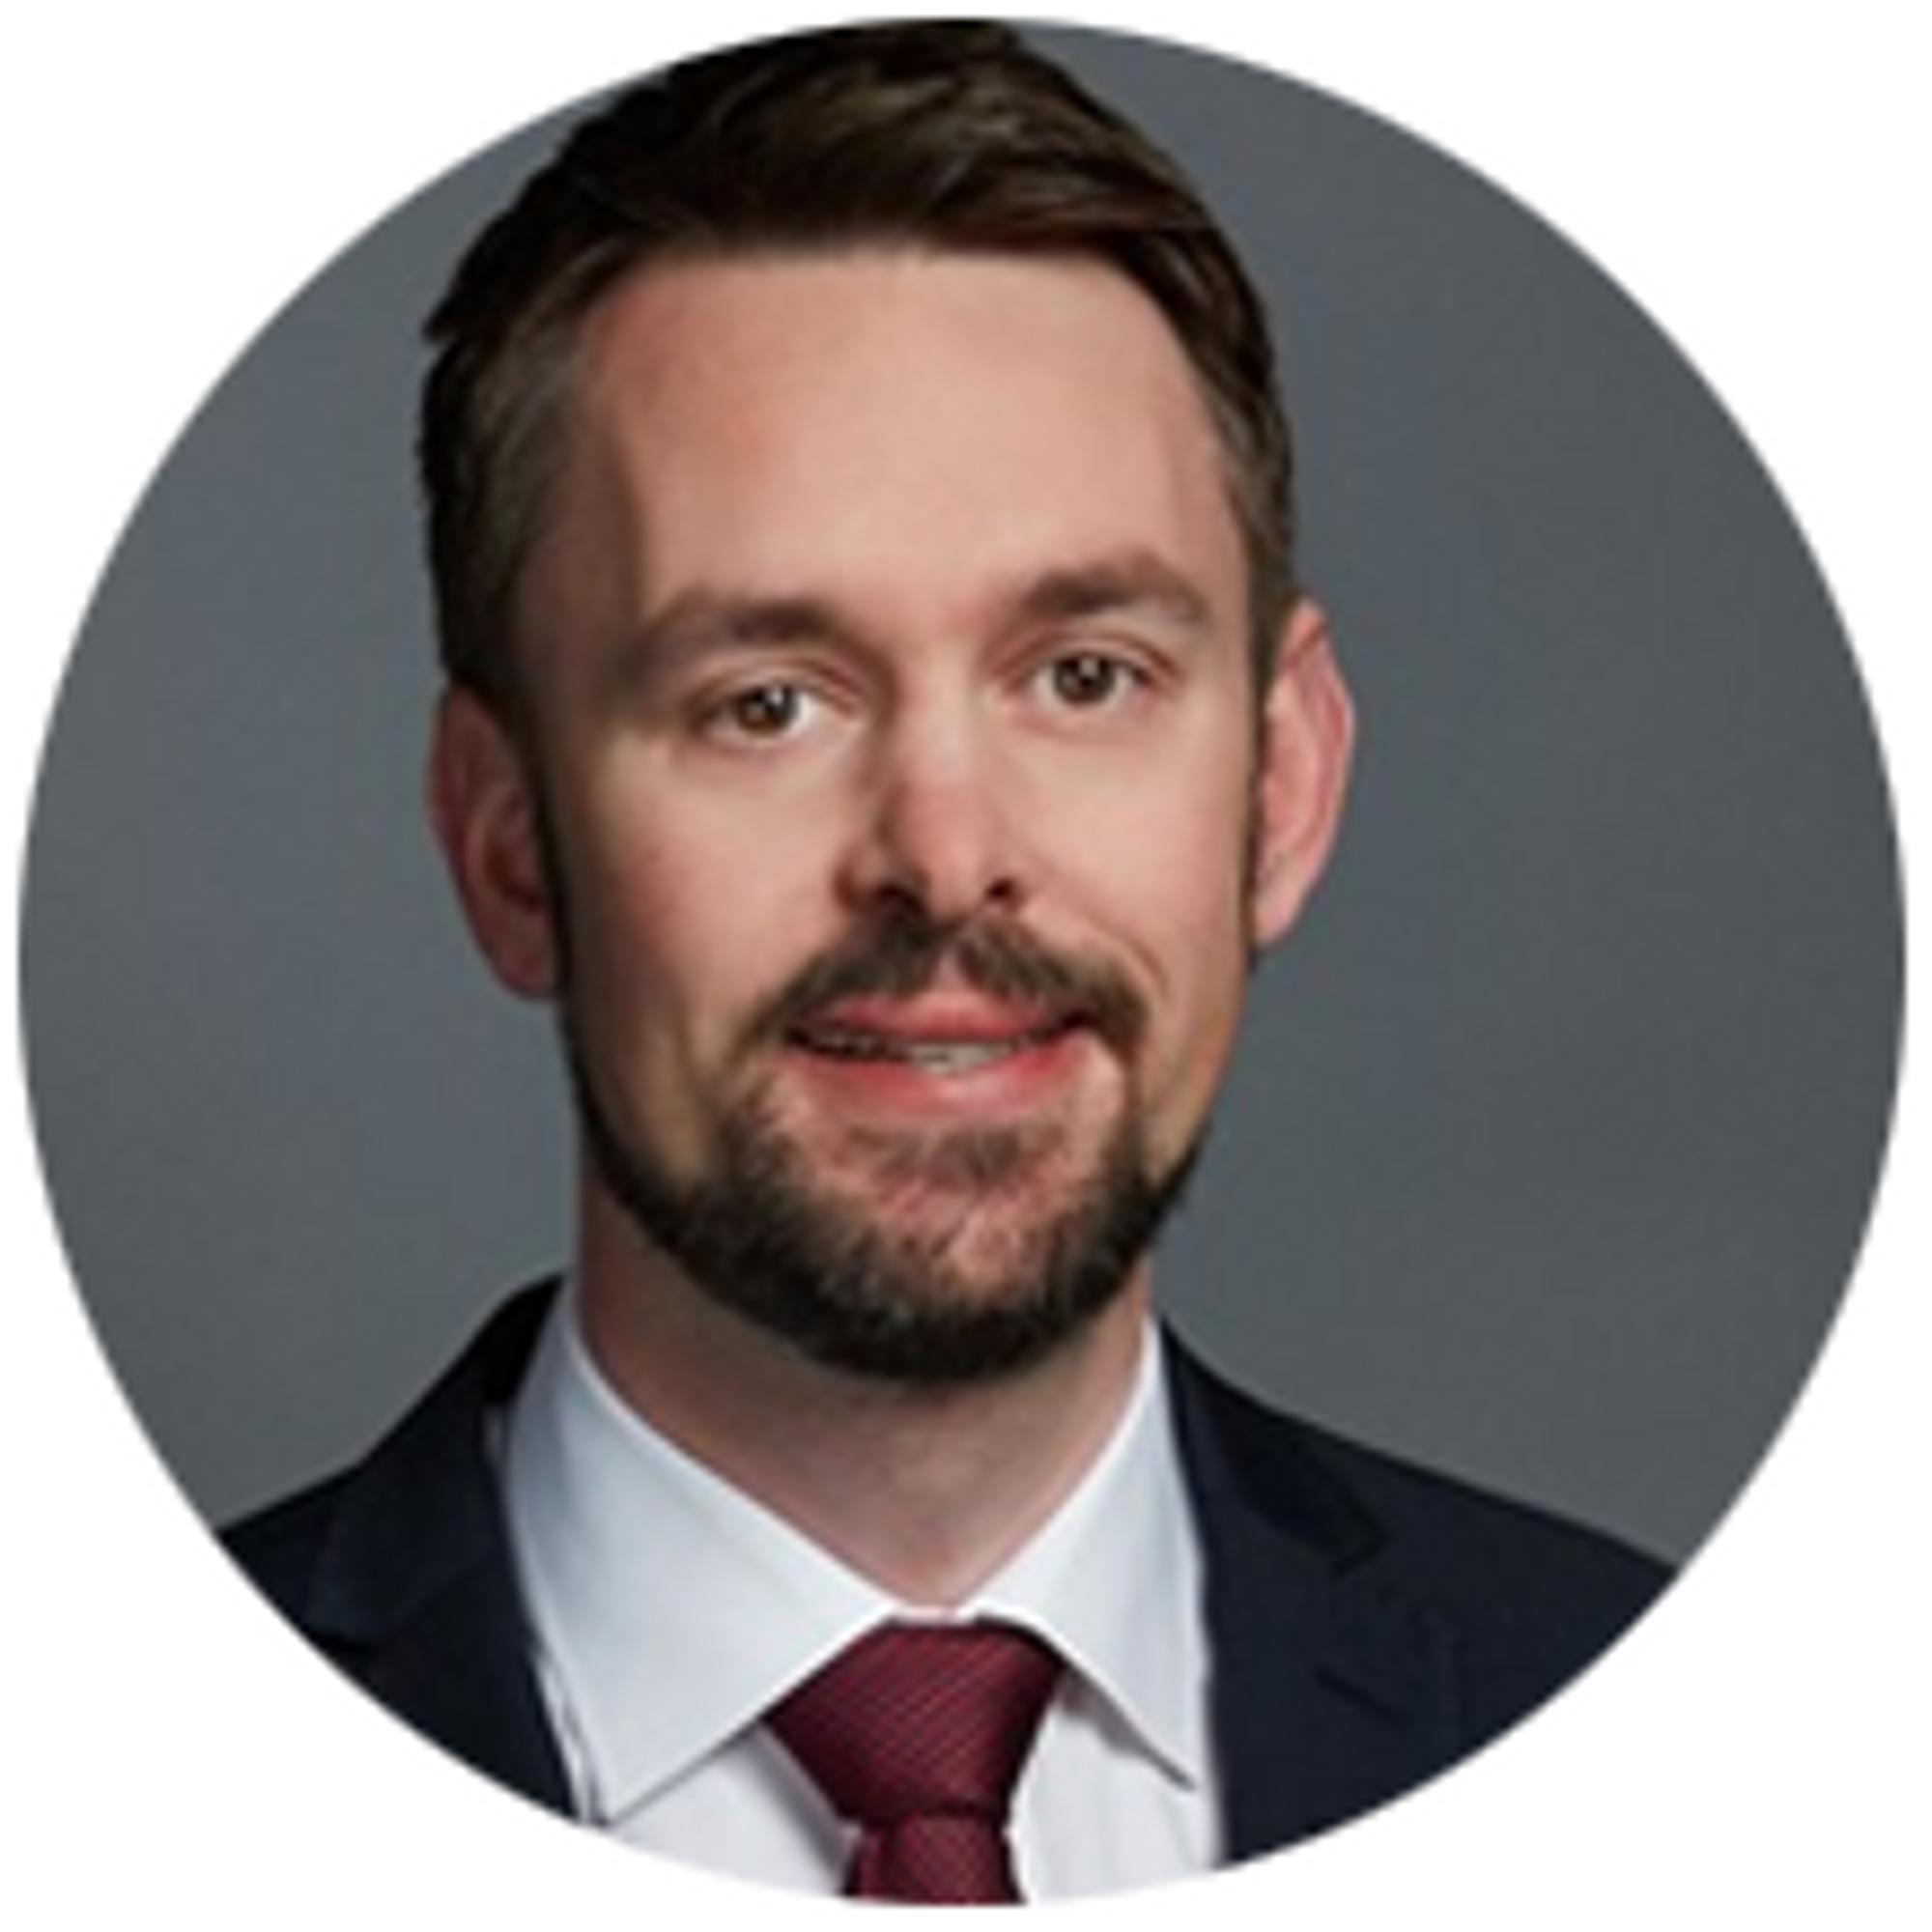 Jens Christian Gjesti